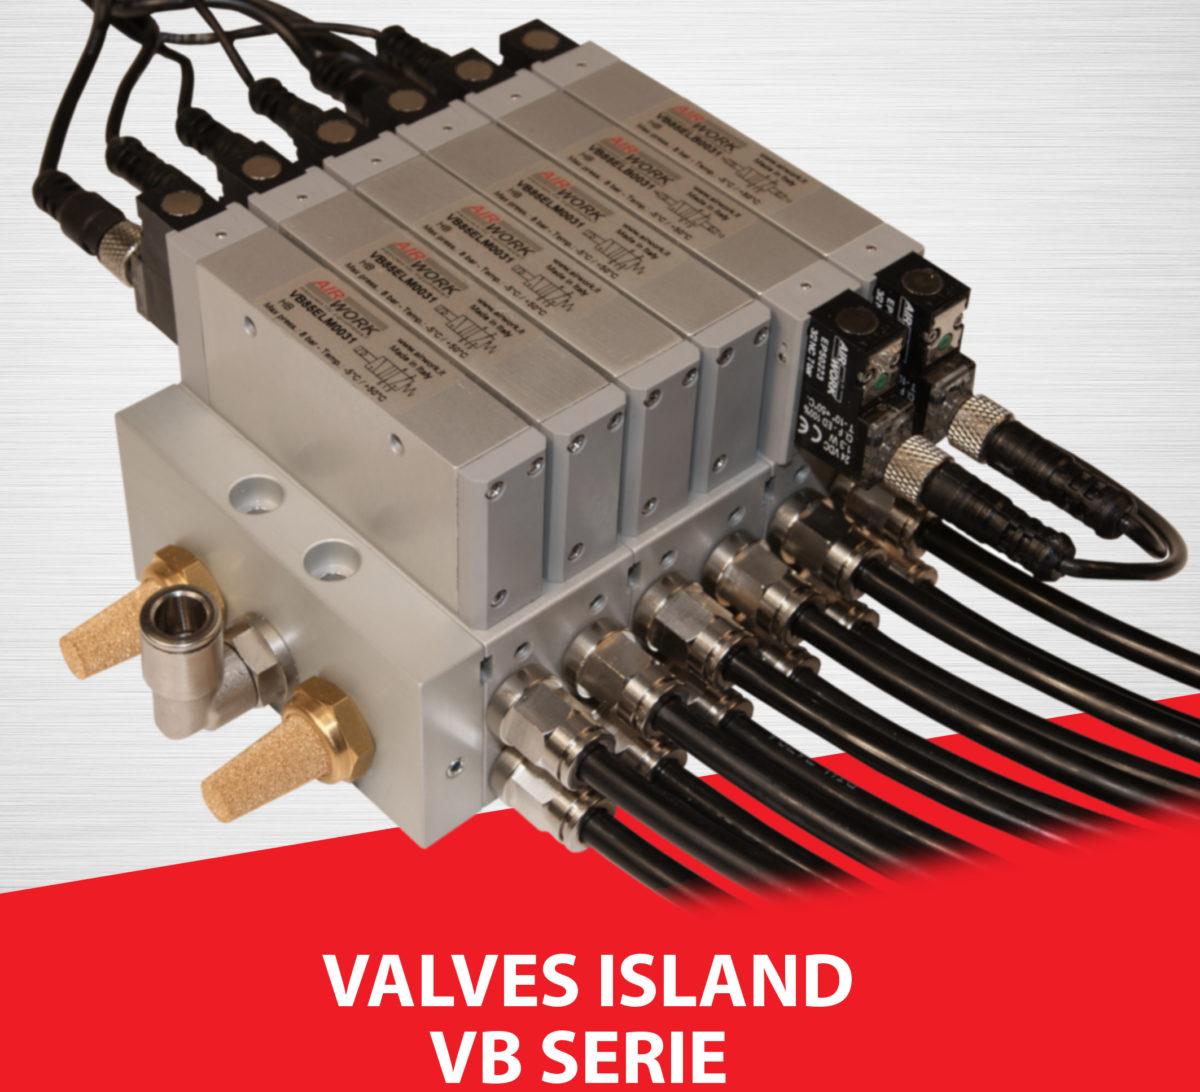 Valve Island Series VB